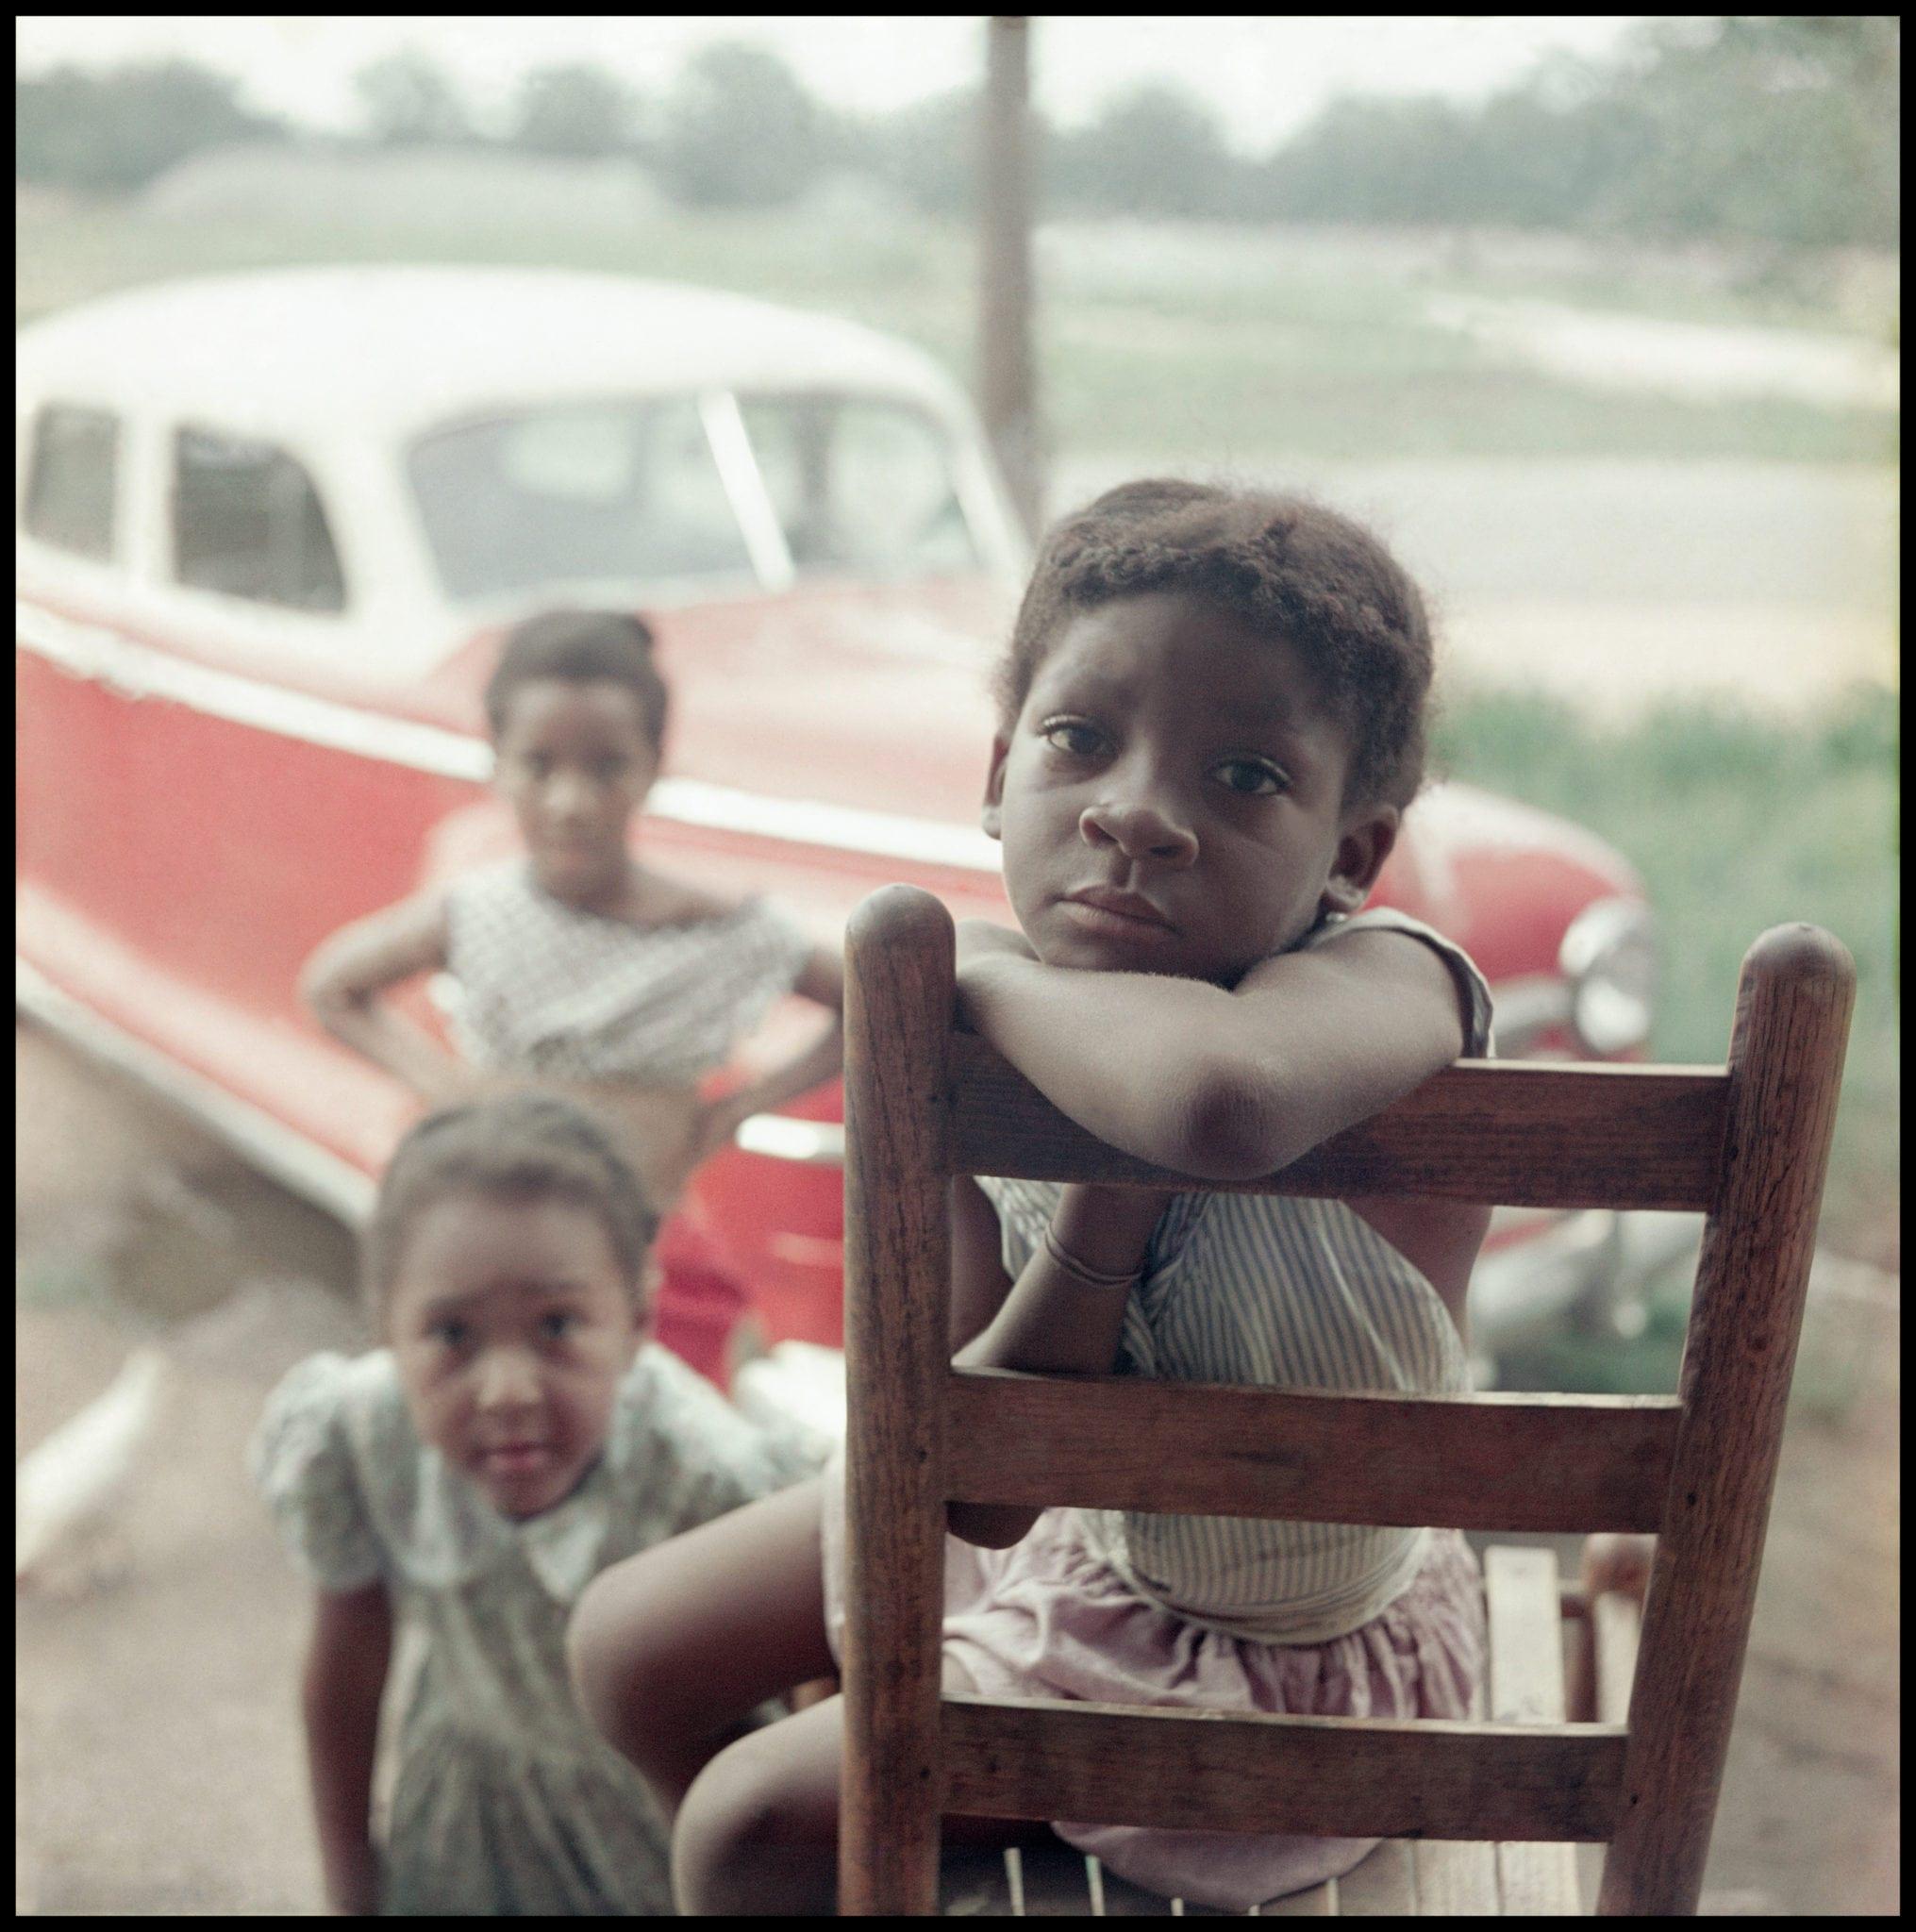 Gordon Parks: Untitled, Shady Grove, Alabama, 1956. Courtesy of and copyright The Gordon Parks Foundation.